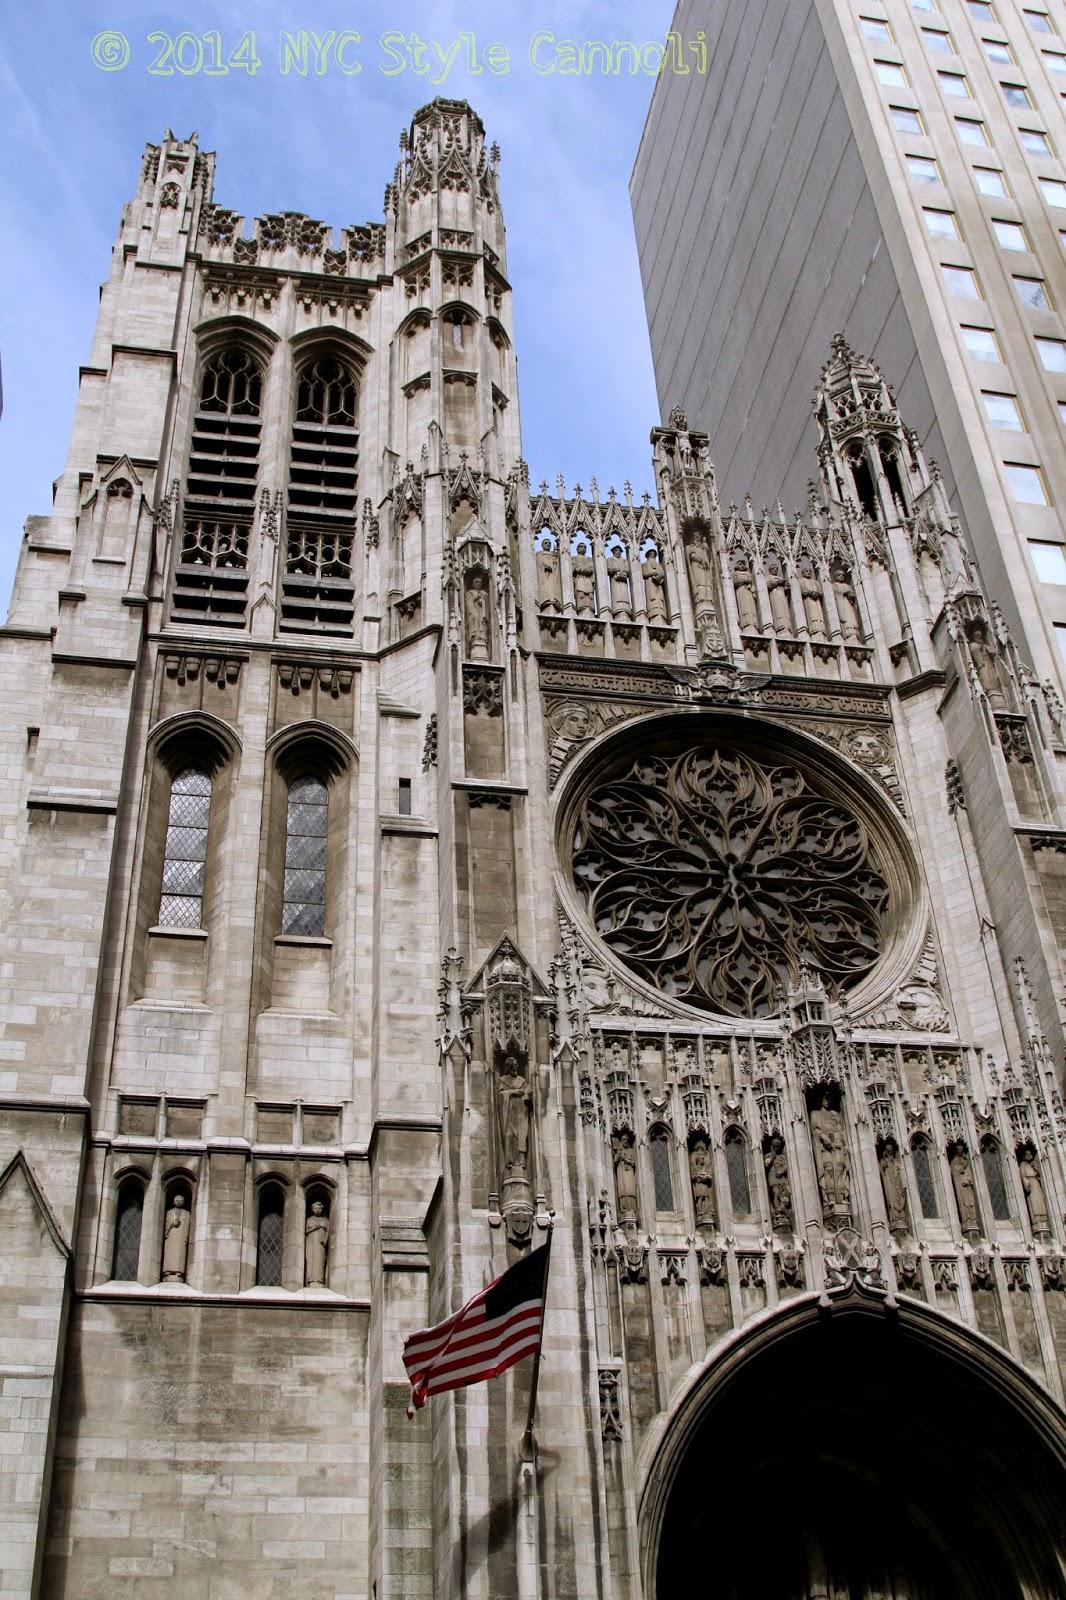 st thomas church on 5th avenue nyc style a little cannoli